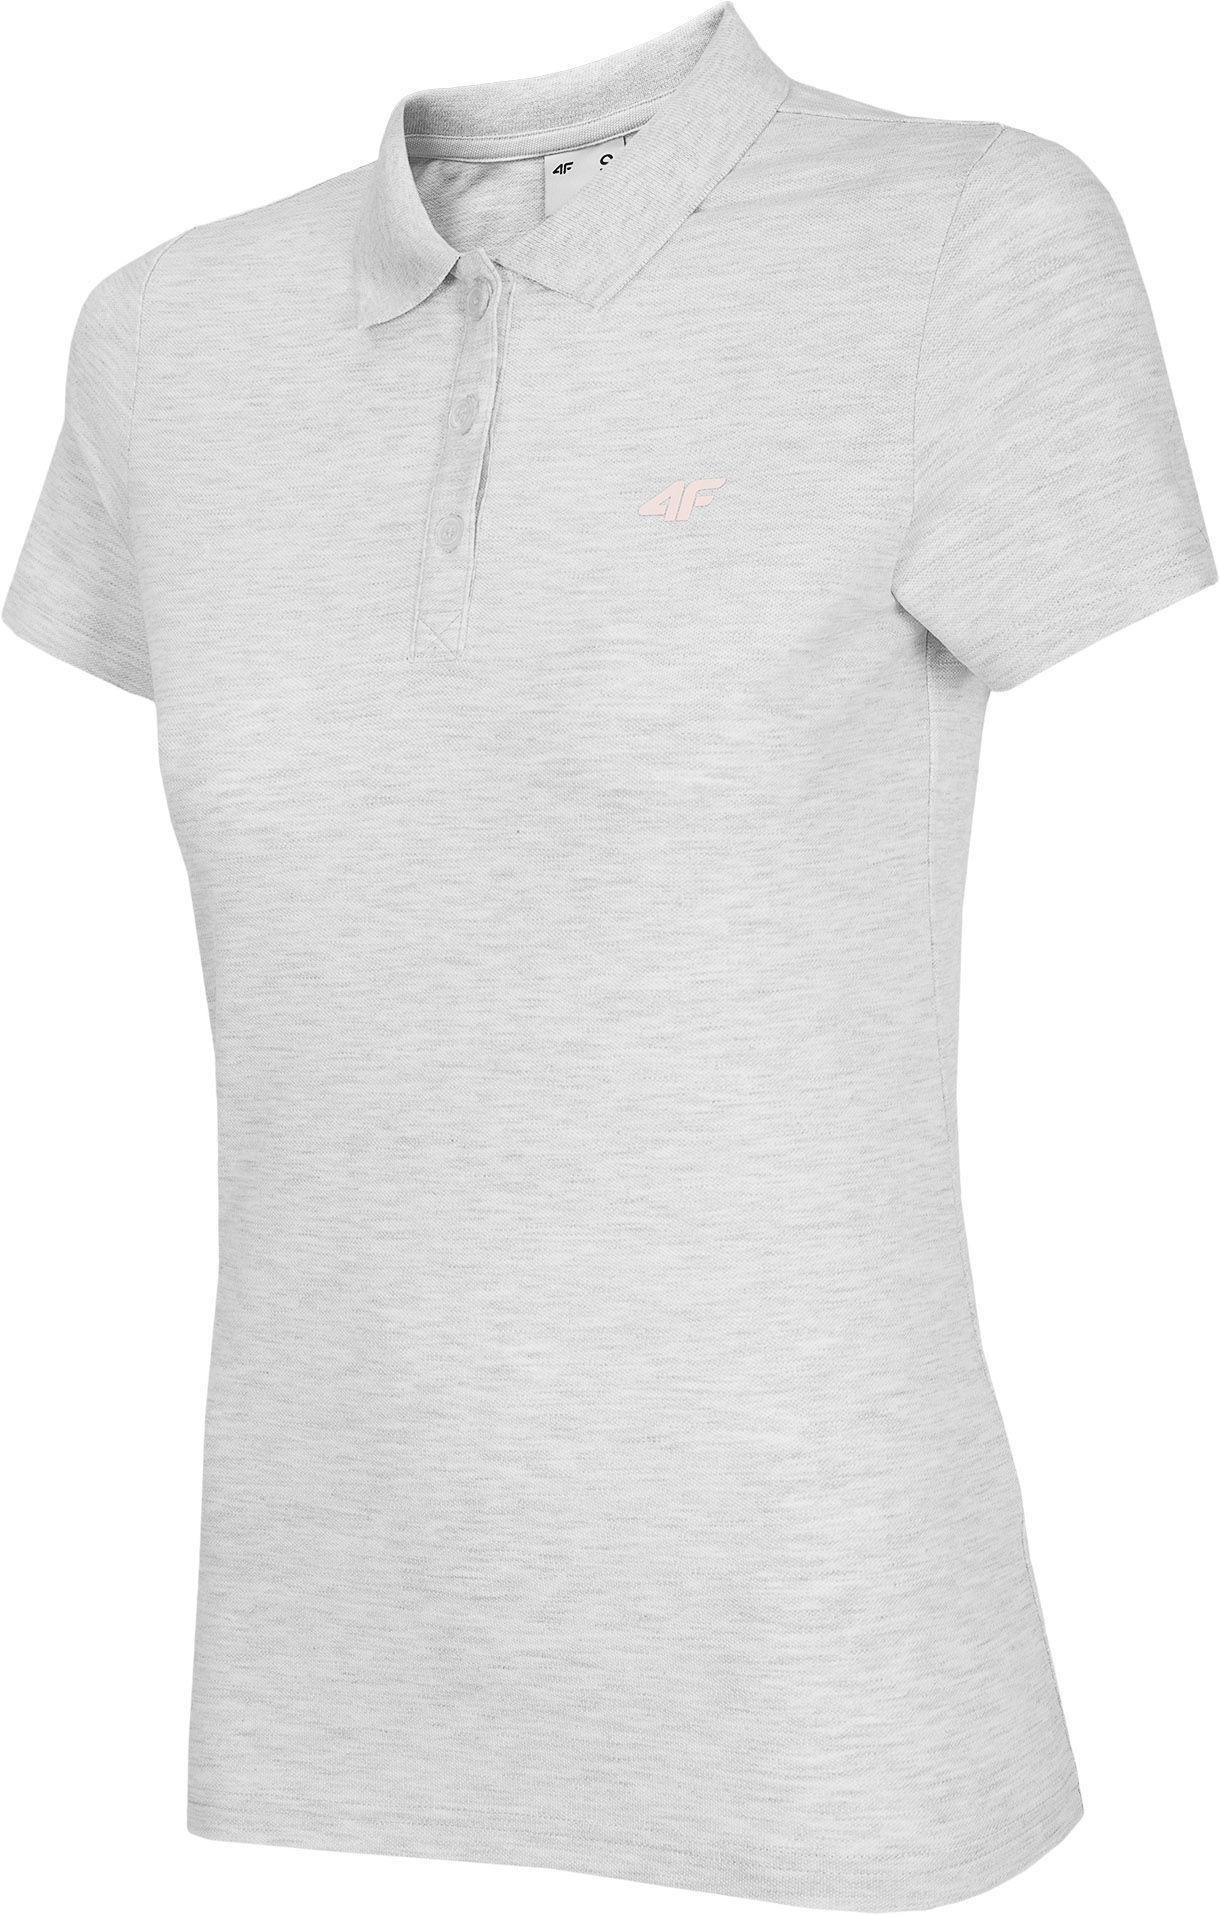 Koszulka polo damska 4F TSD007 - biały melanż (NOSH4-TSD007-10M)